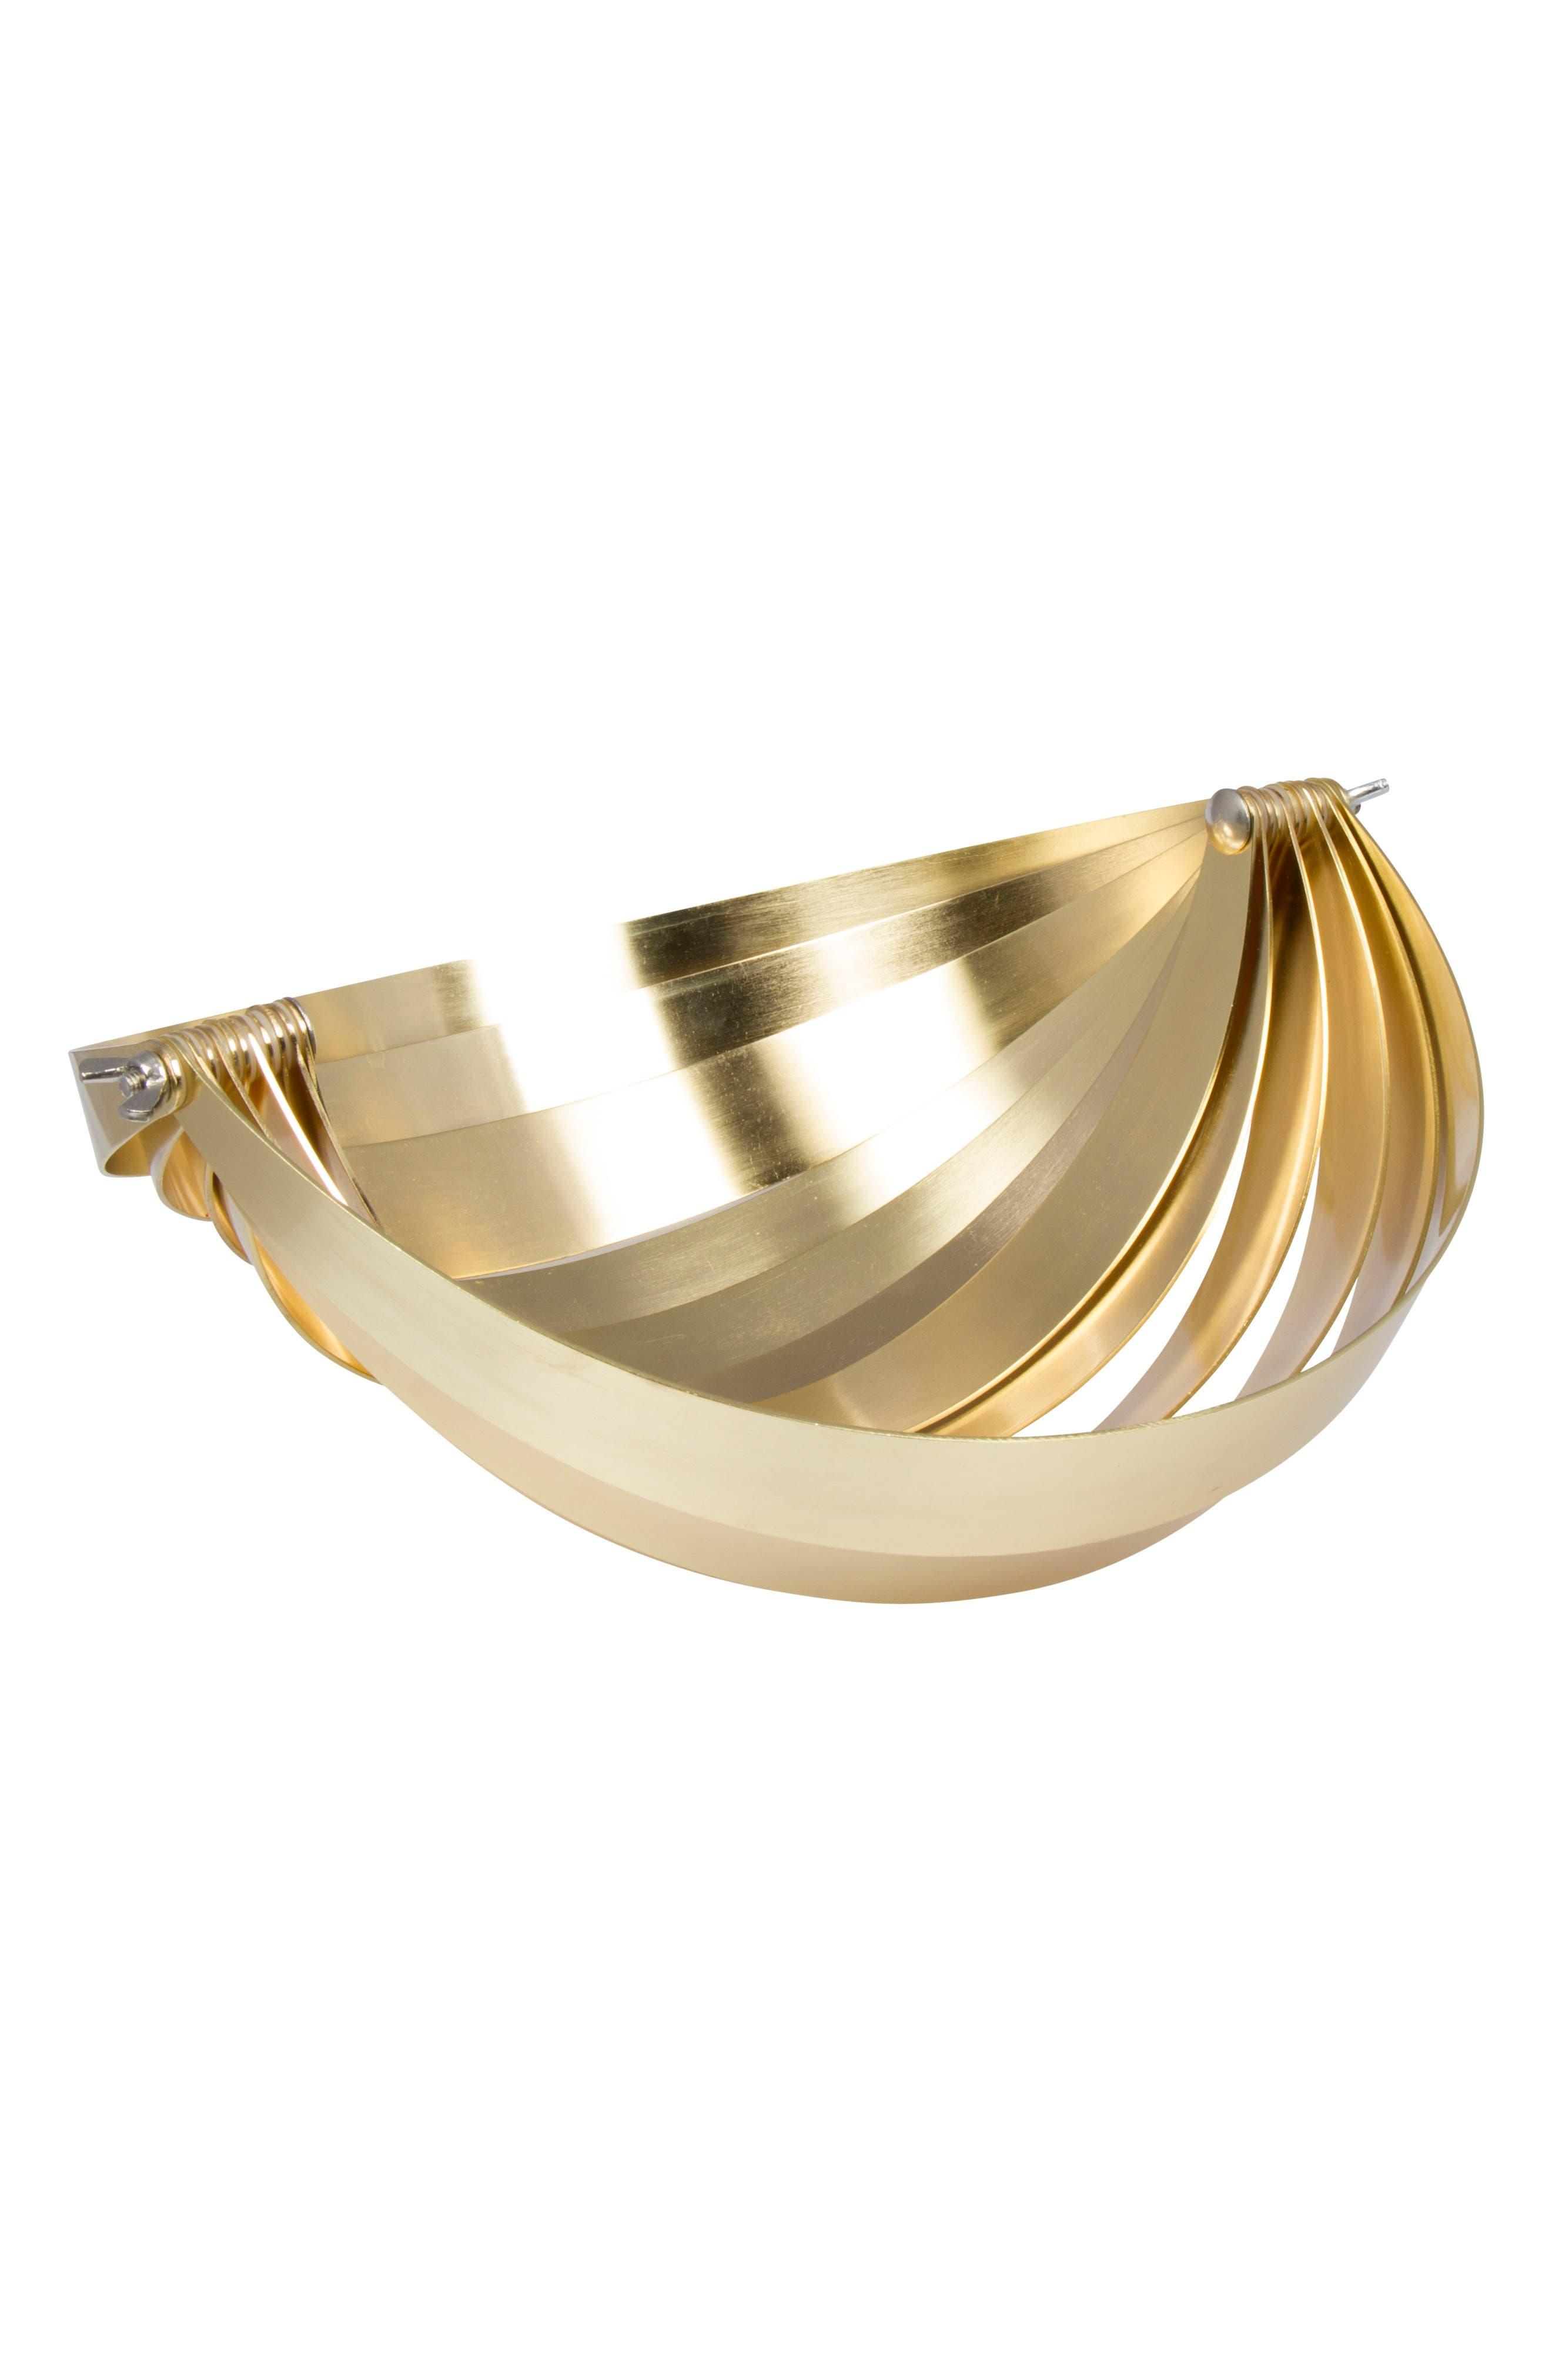 Alternate Image 1 Selected - Eightmood Foldabowl Decorative Bowl